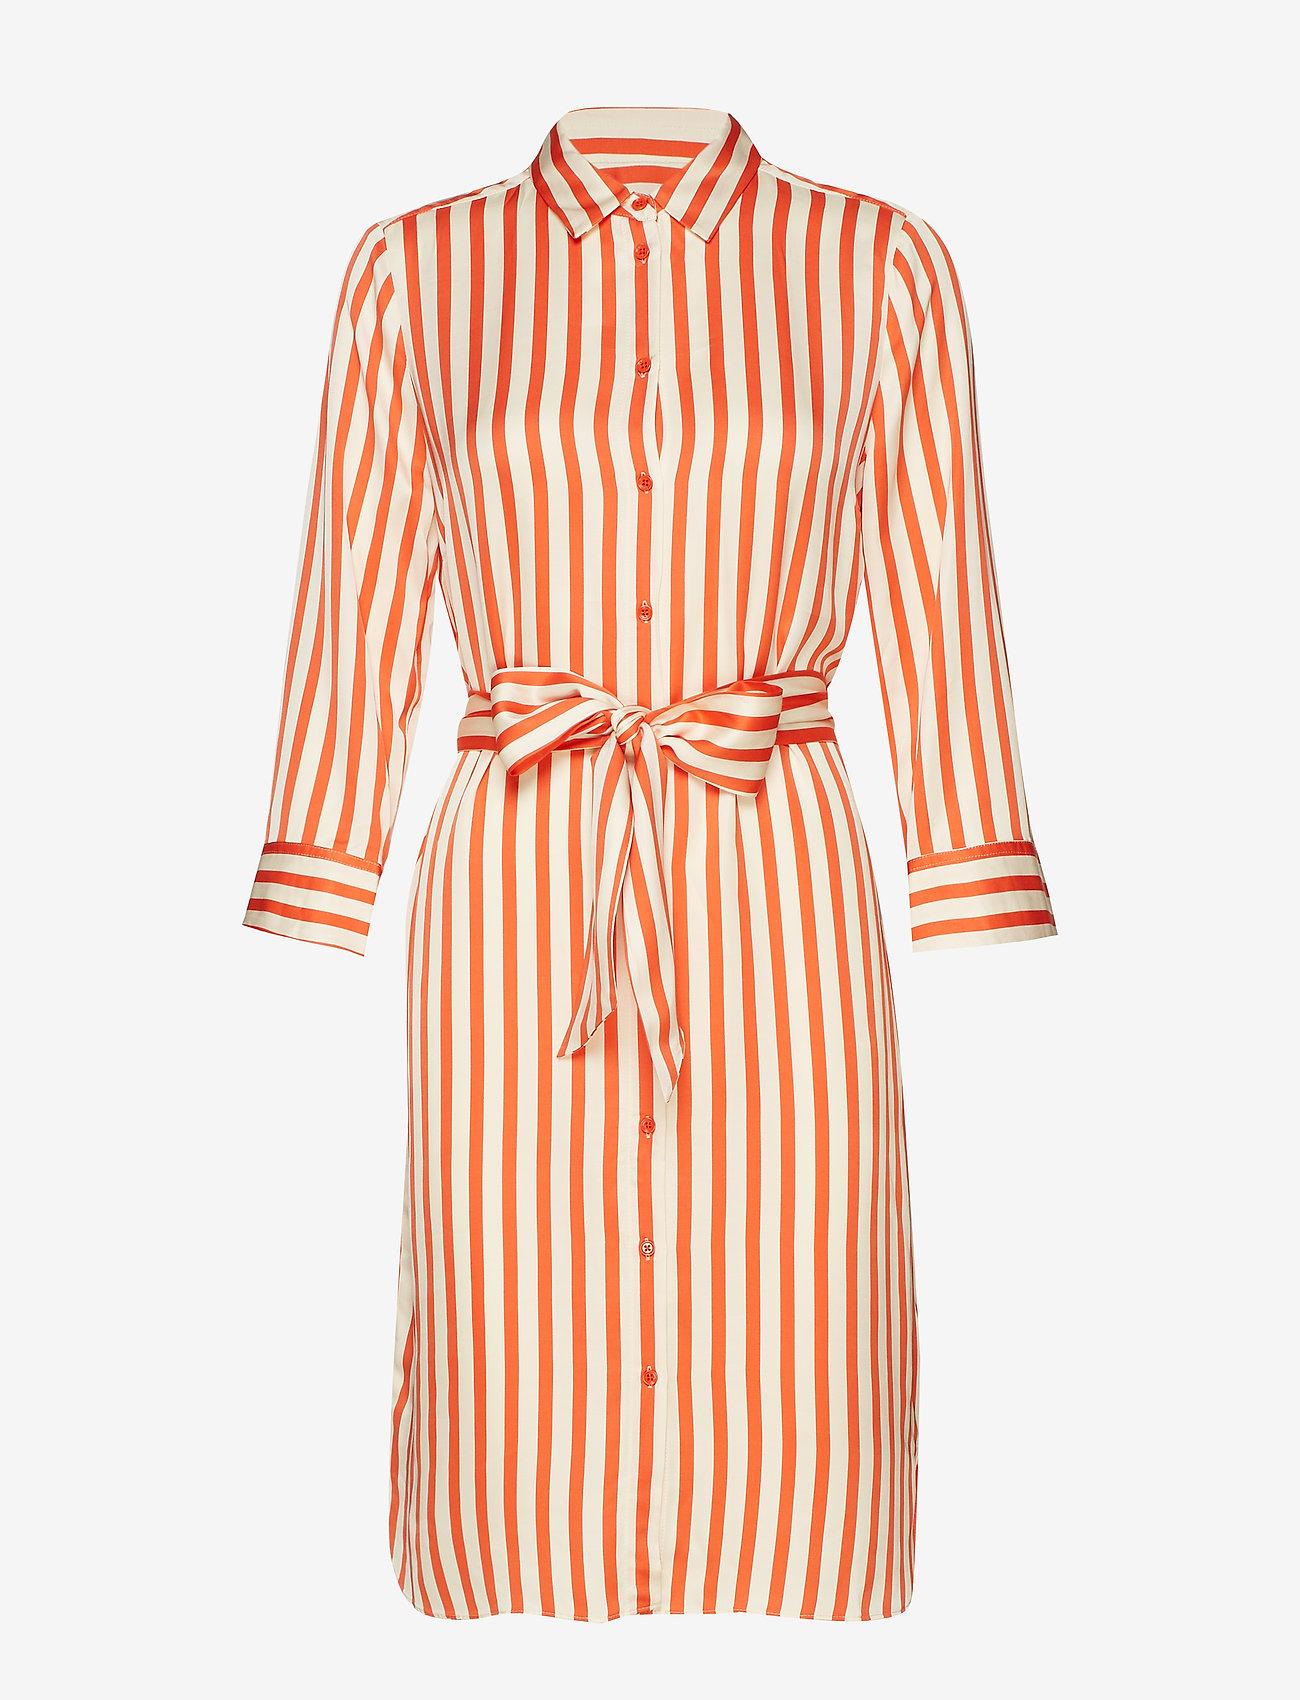 Tamaraiw Dress (Blood Orange Block Stripe) (520 kr) - InWear